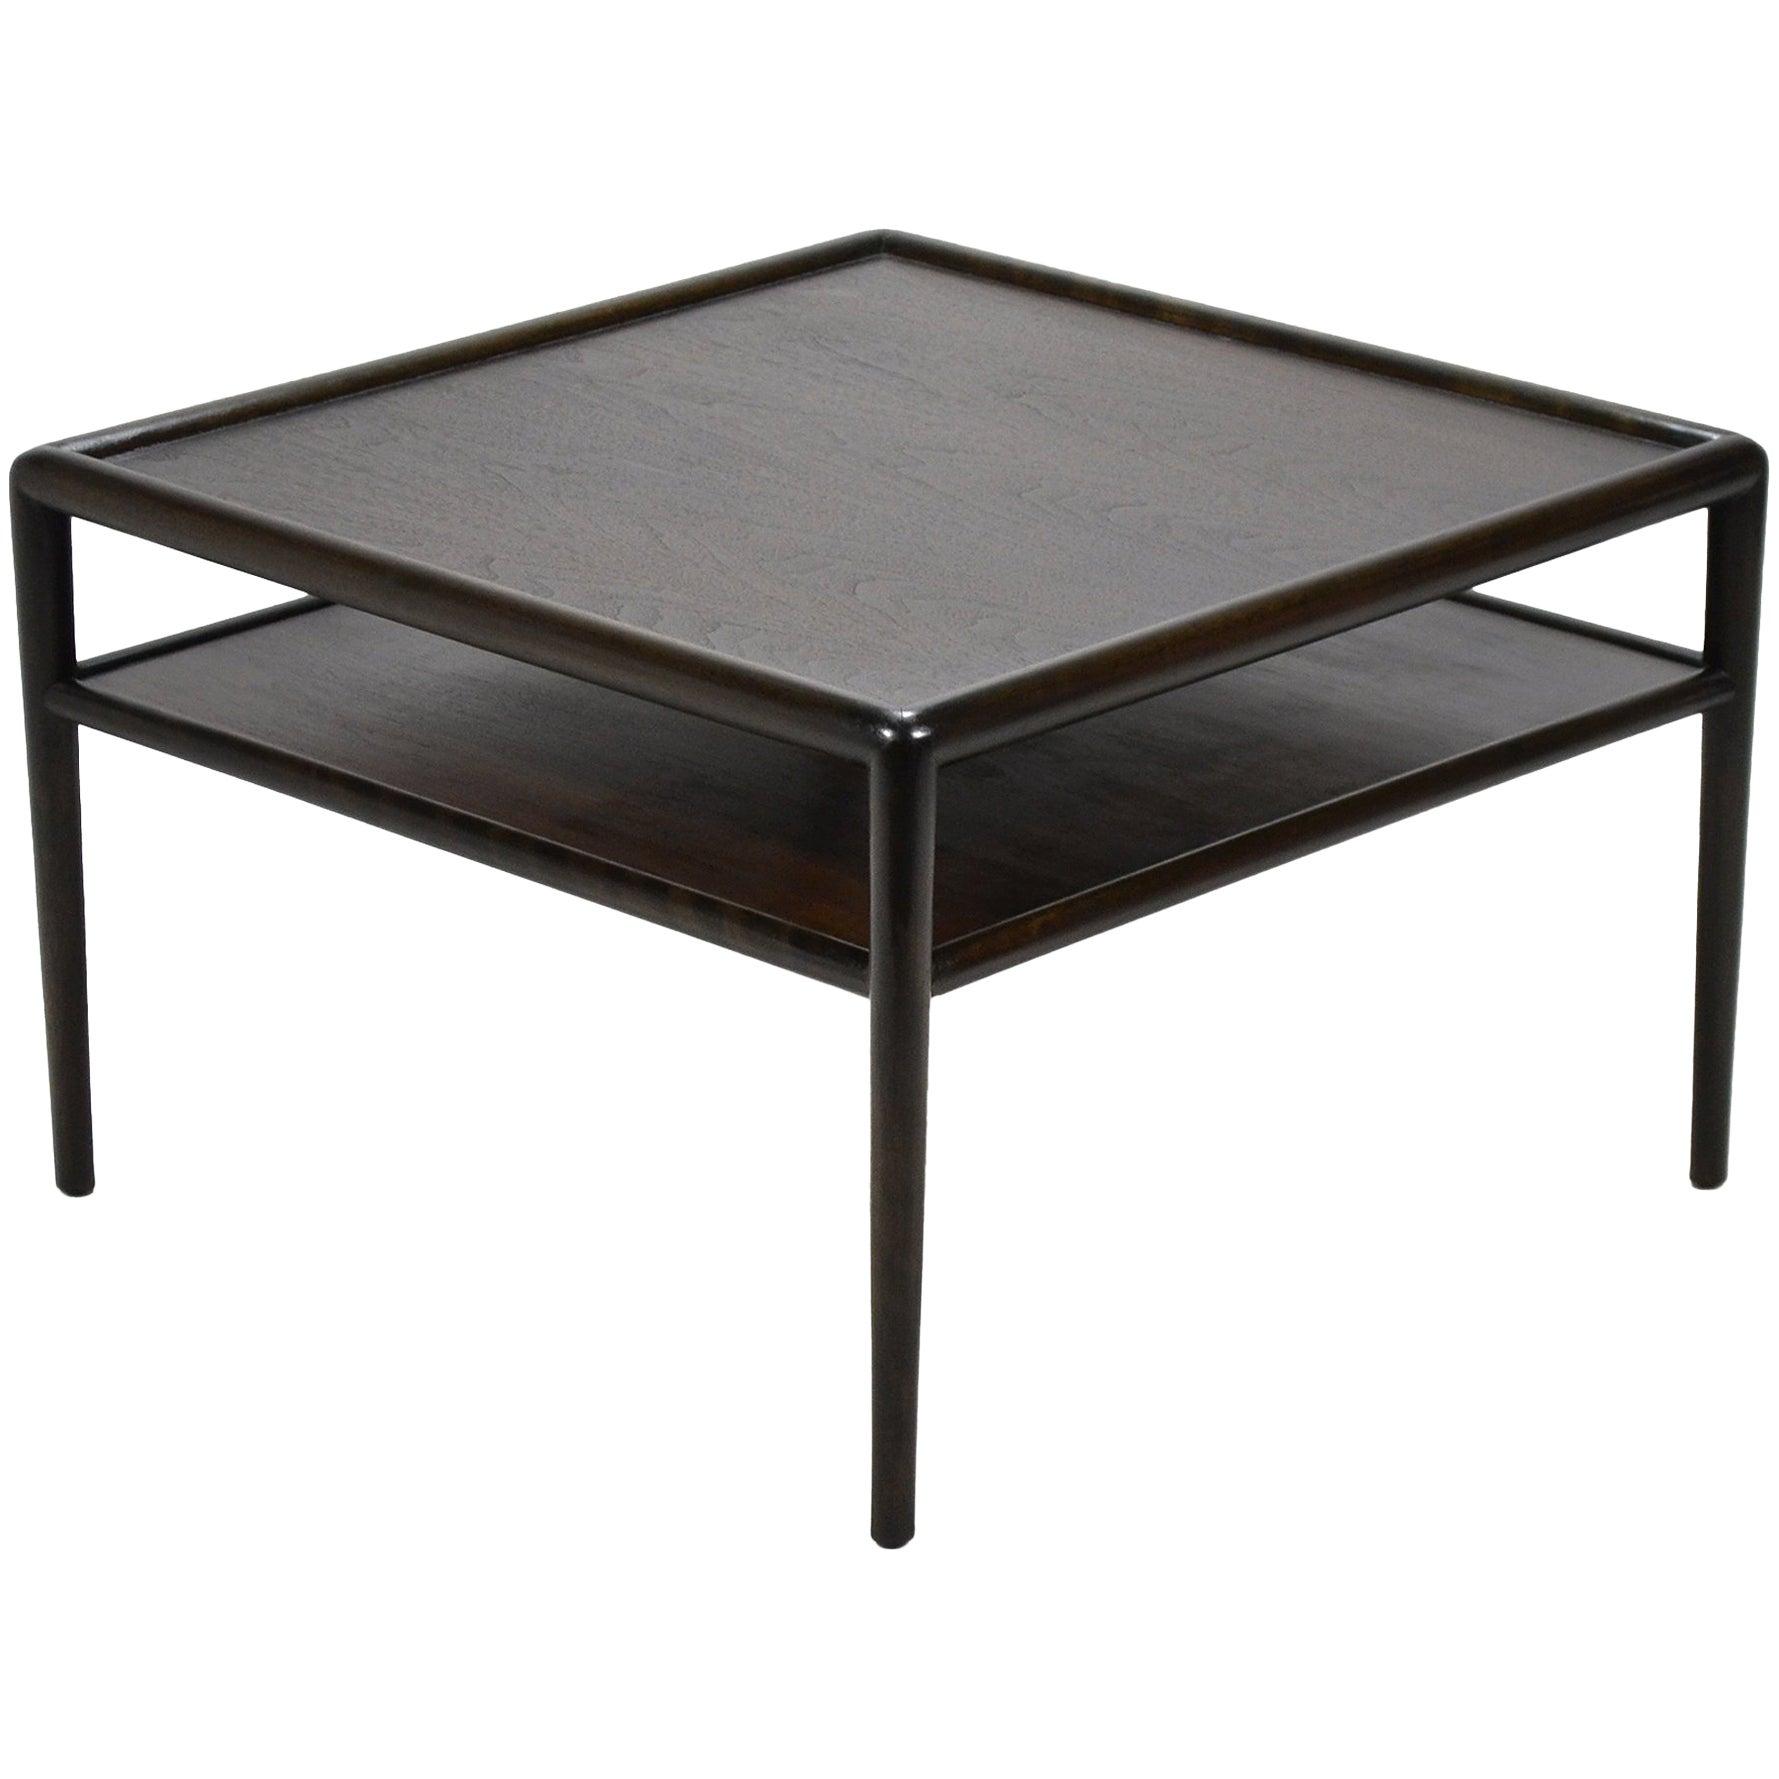 T.H. Robsjohn-Gibbings Two-Tiered Table by Widdicomb